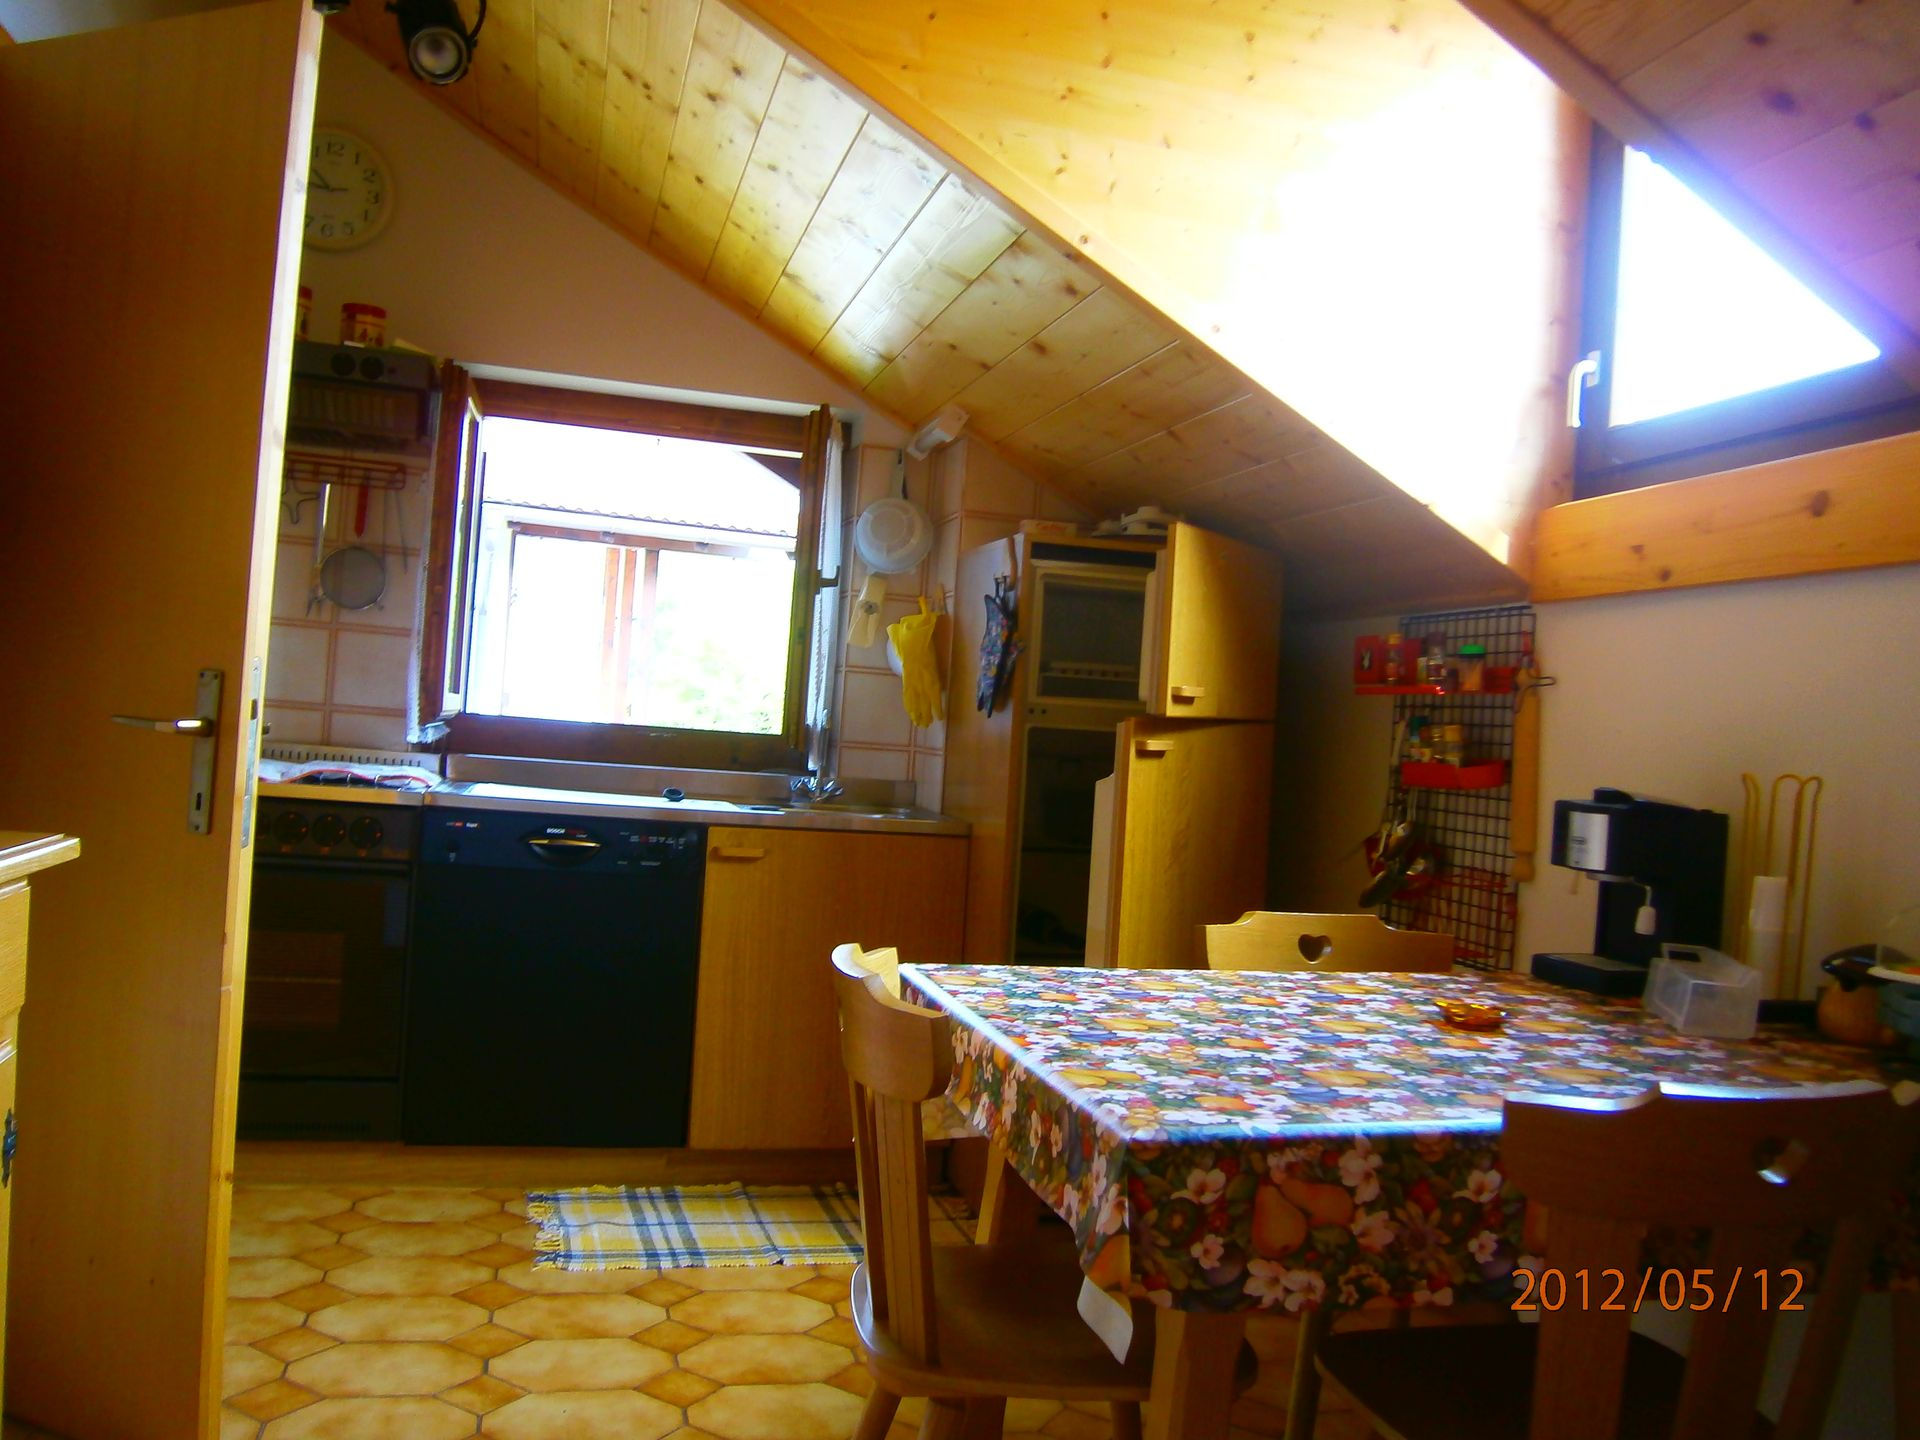 affitto appartamento montagna carano 7998 (20120926190906-2012-60580-NDP.jpg)